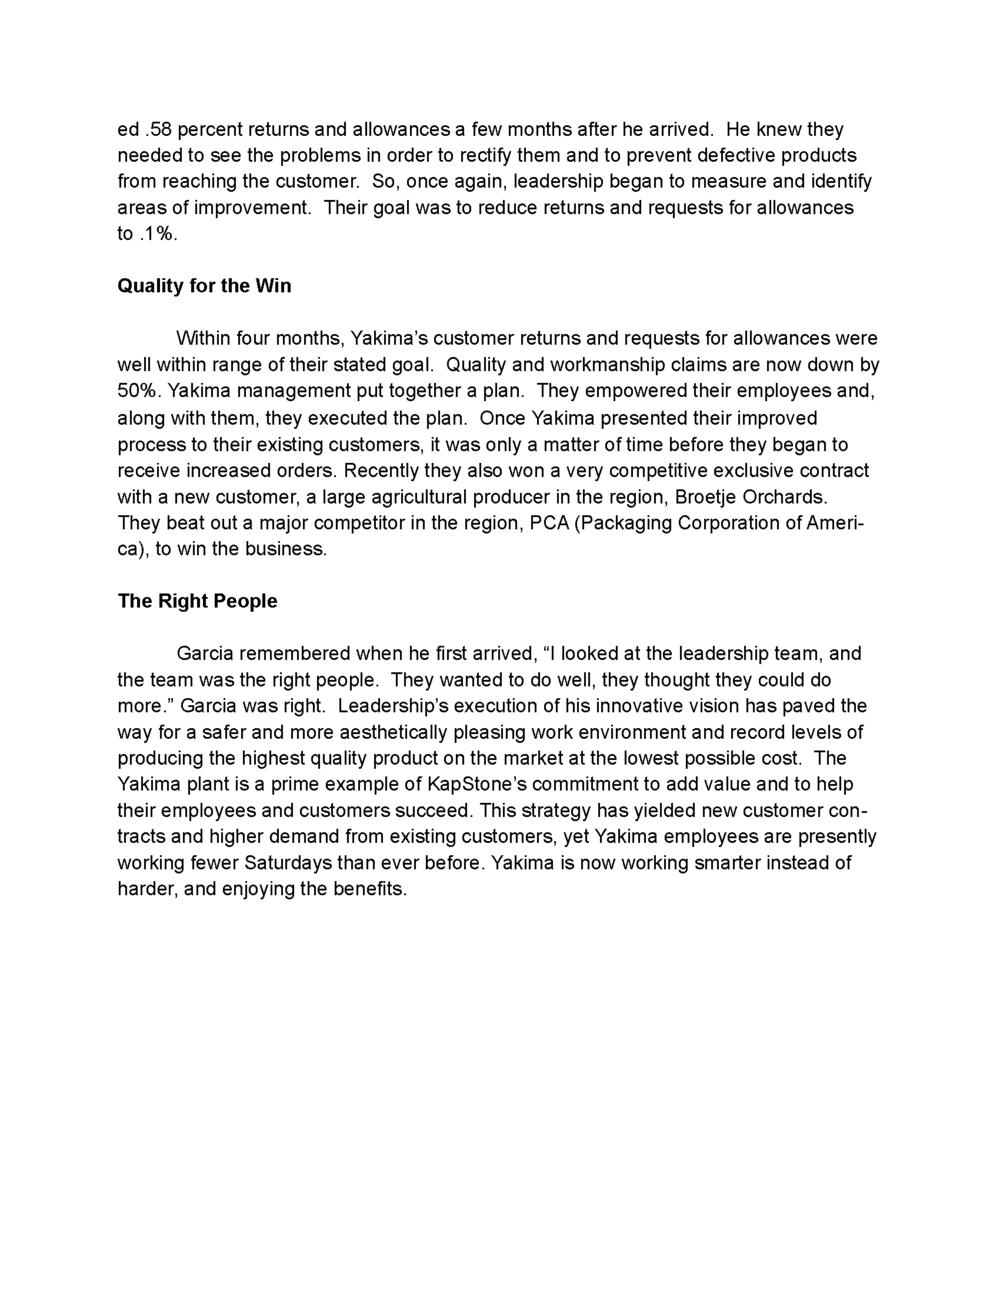 Yakima Article-FINAL_Page_3.png